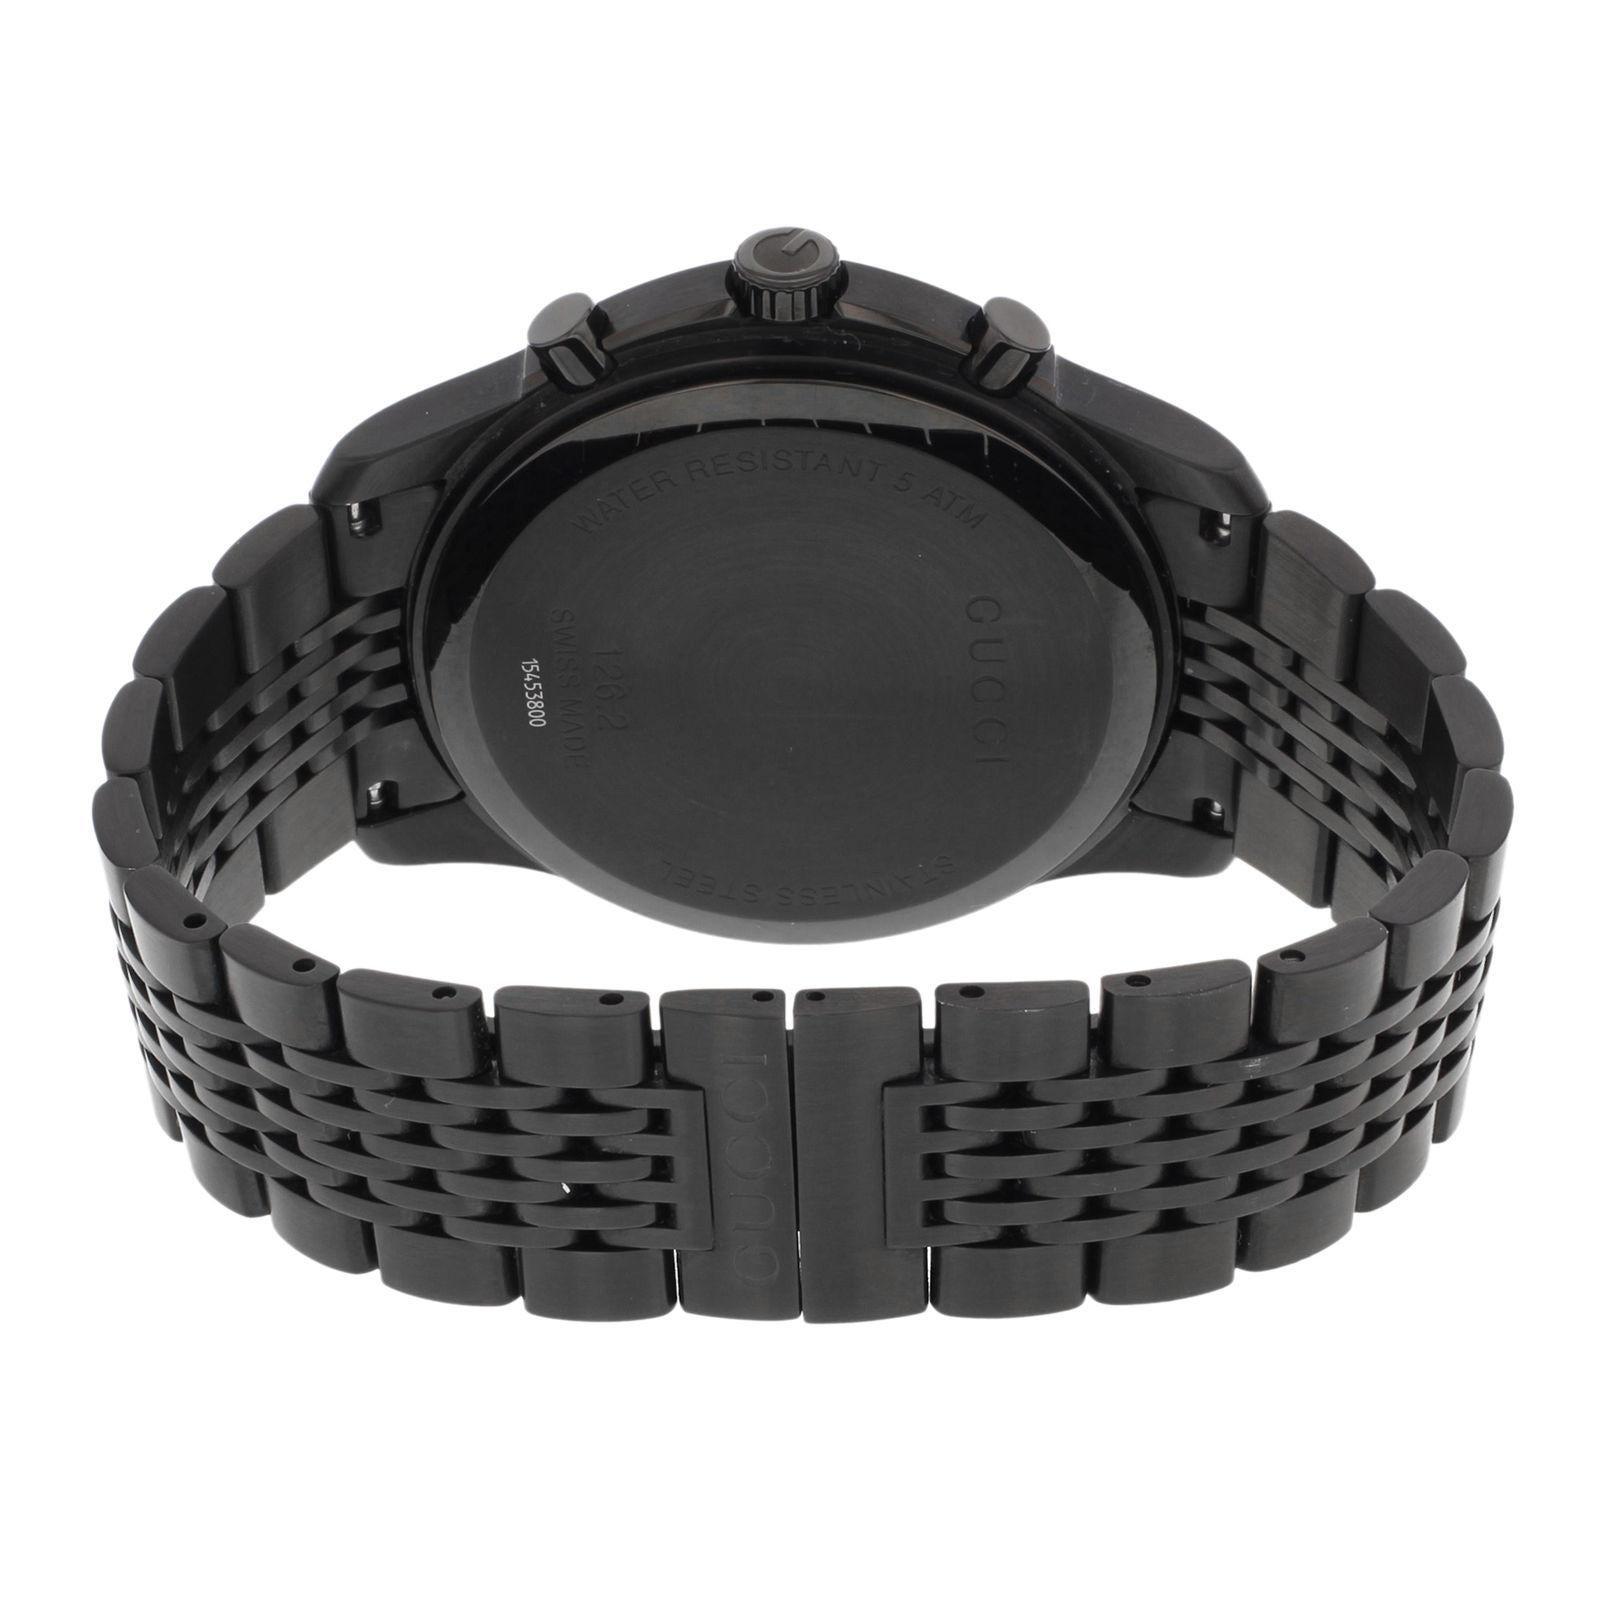 a3061abf180 Gucci 126 Black PVD Steel Chrono Tachymeter Quartz Men s Watch YA126217 For  Sale at 1stdibs